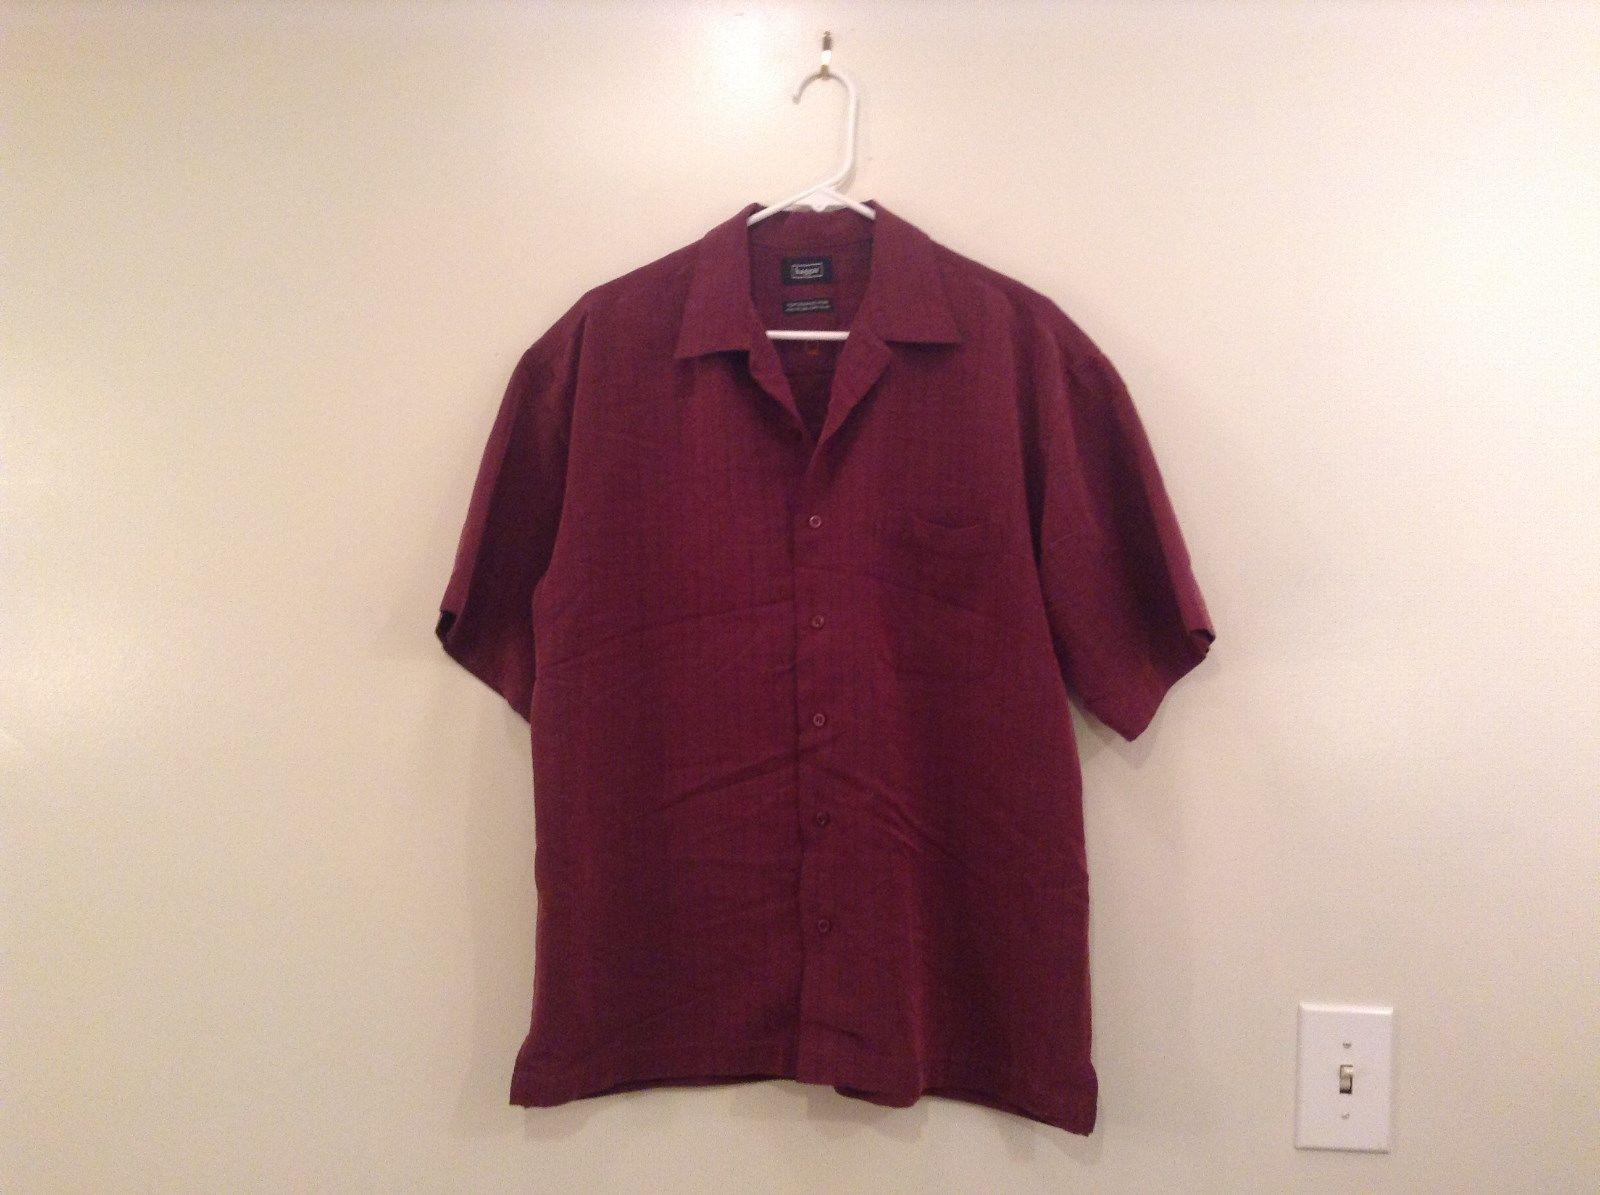 Maroon with Light Visible Plaid Pattern Short Sleeve Haggar Shirt Size Medium